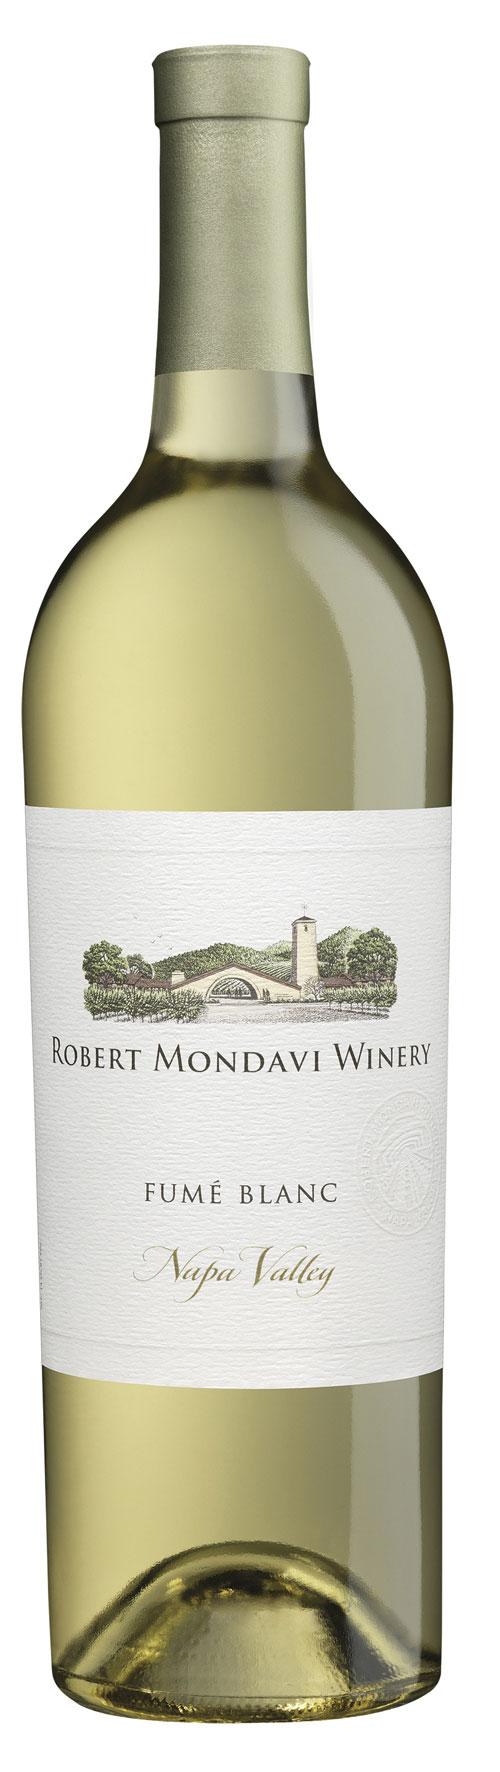 Robert Mondavi Winery Napa Valley Fume Blanc 2018